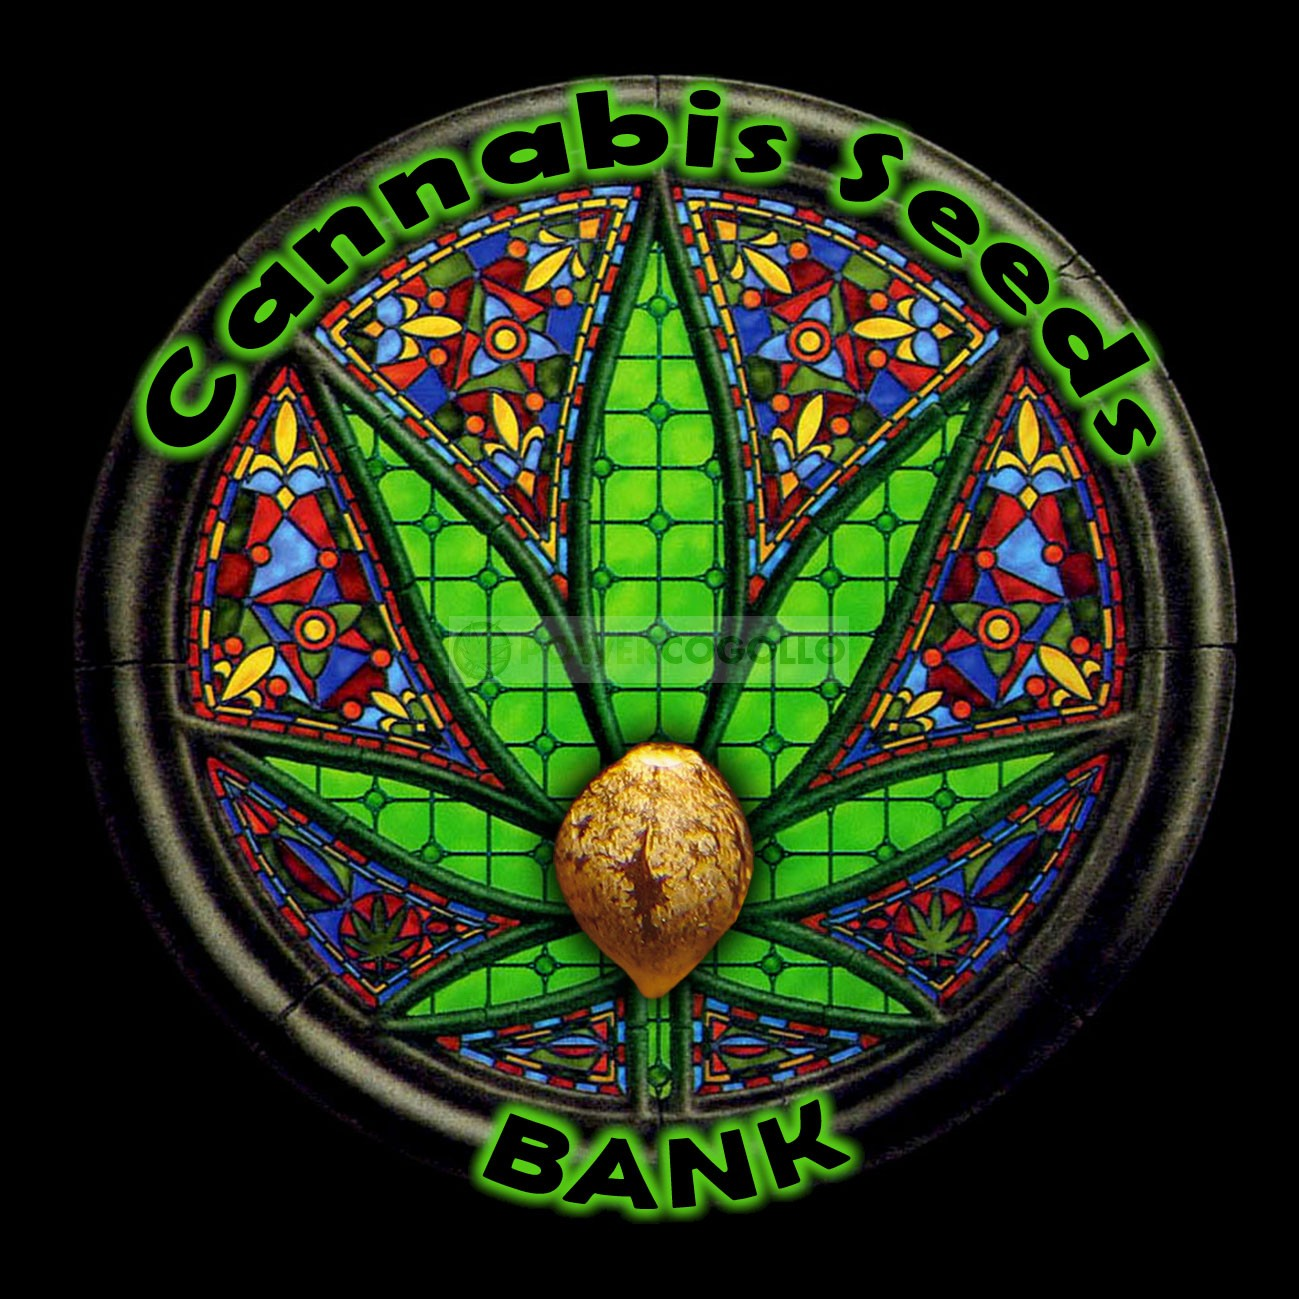 Auto Mandarina (Cannabis Seeds) Feminizada 0